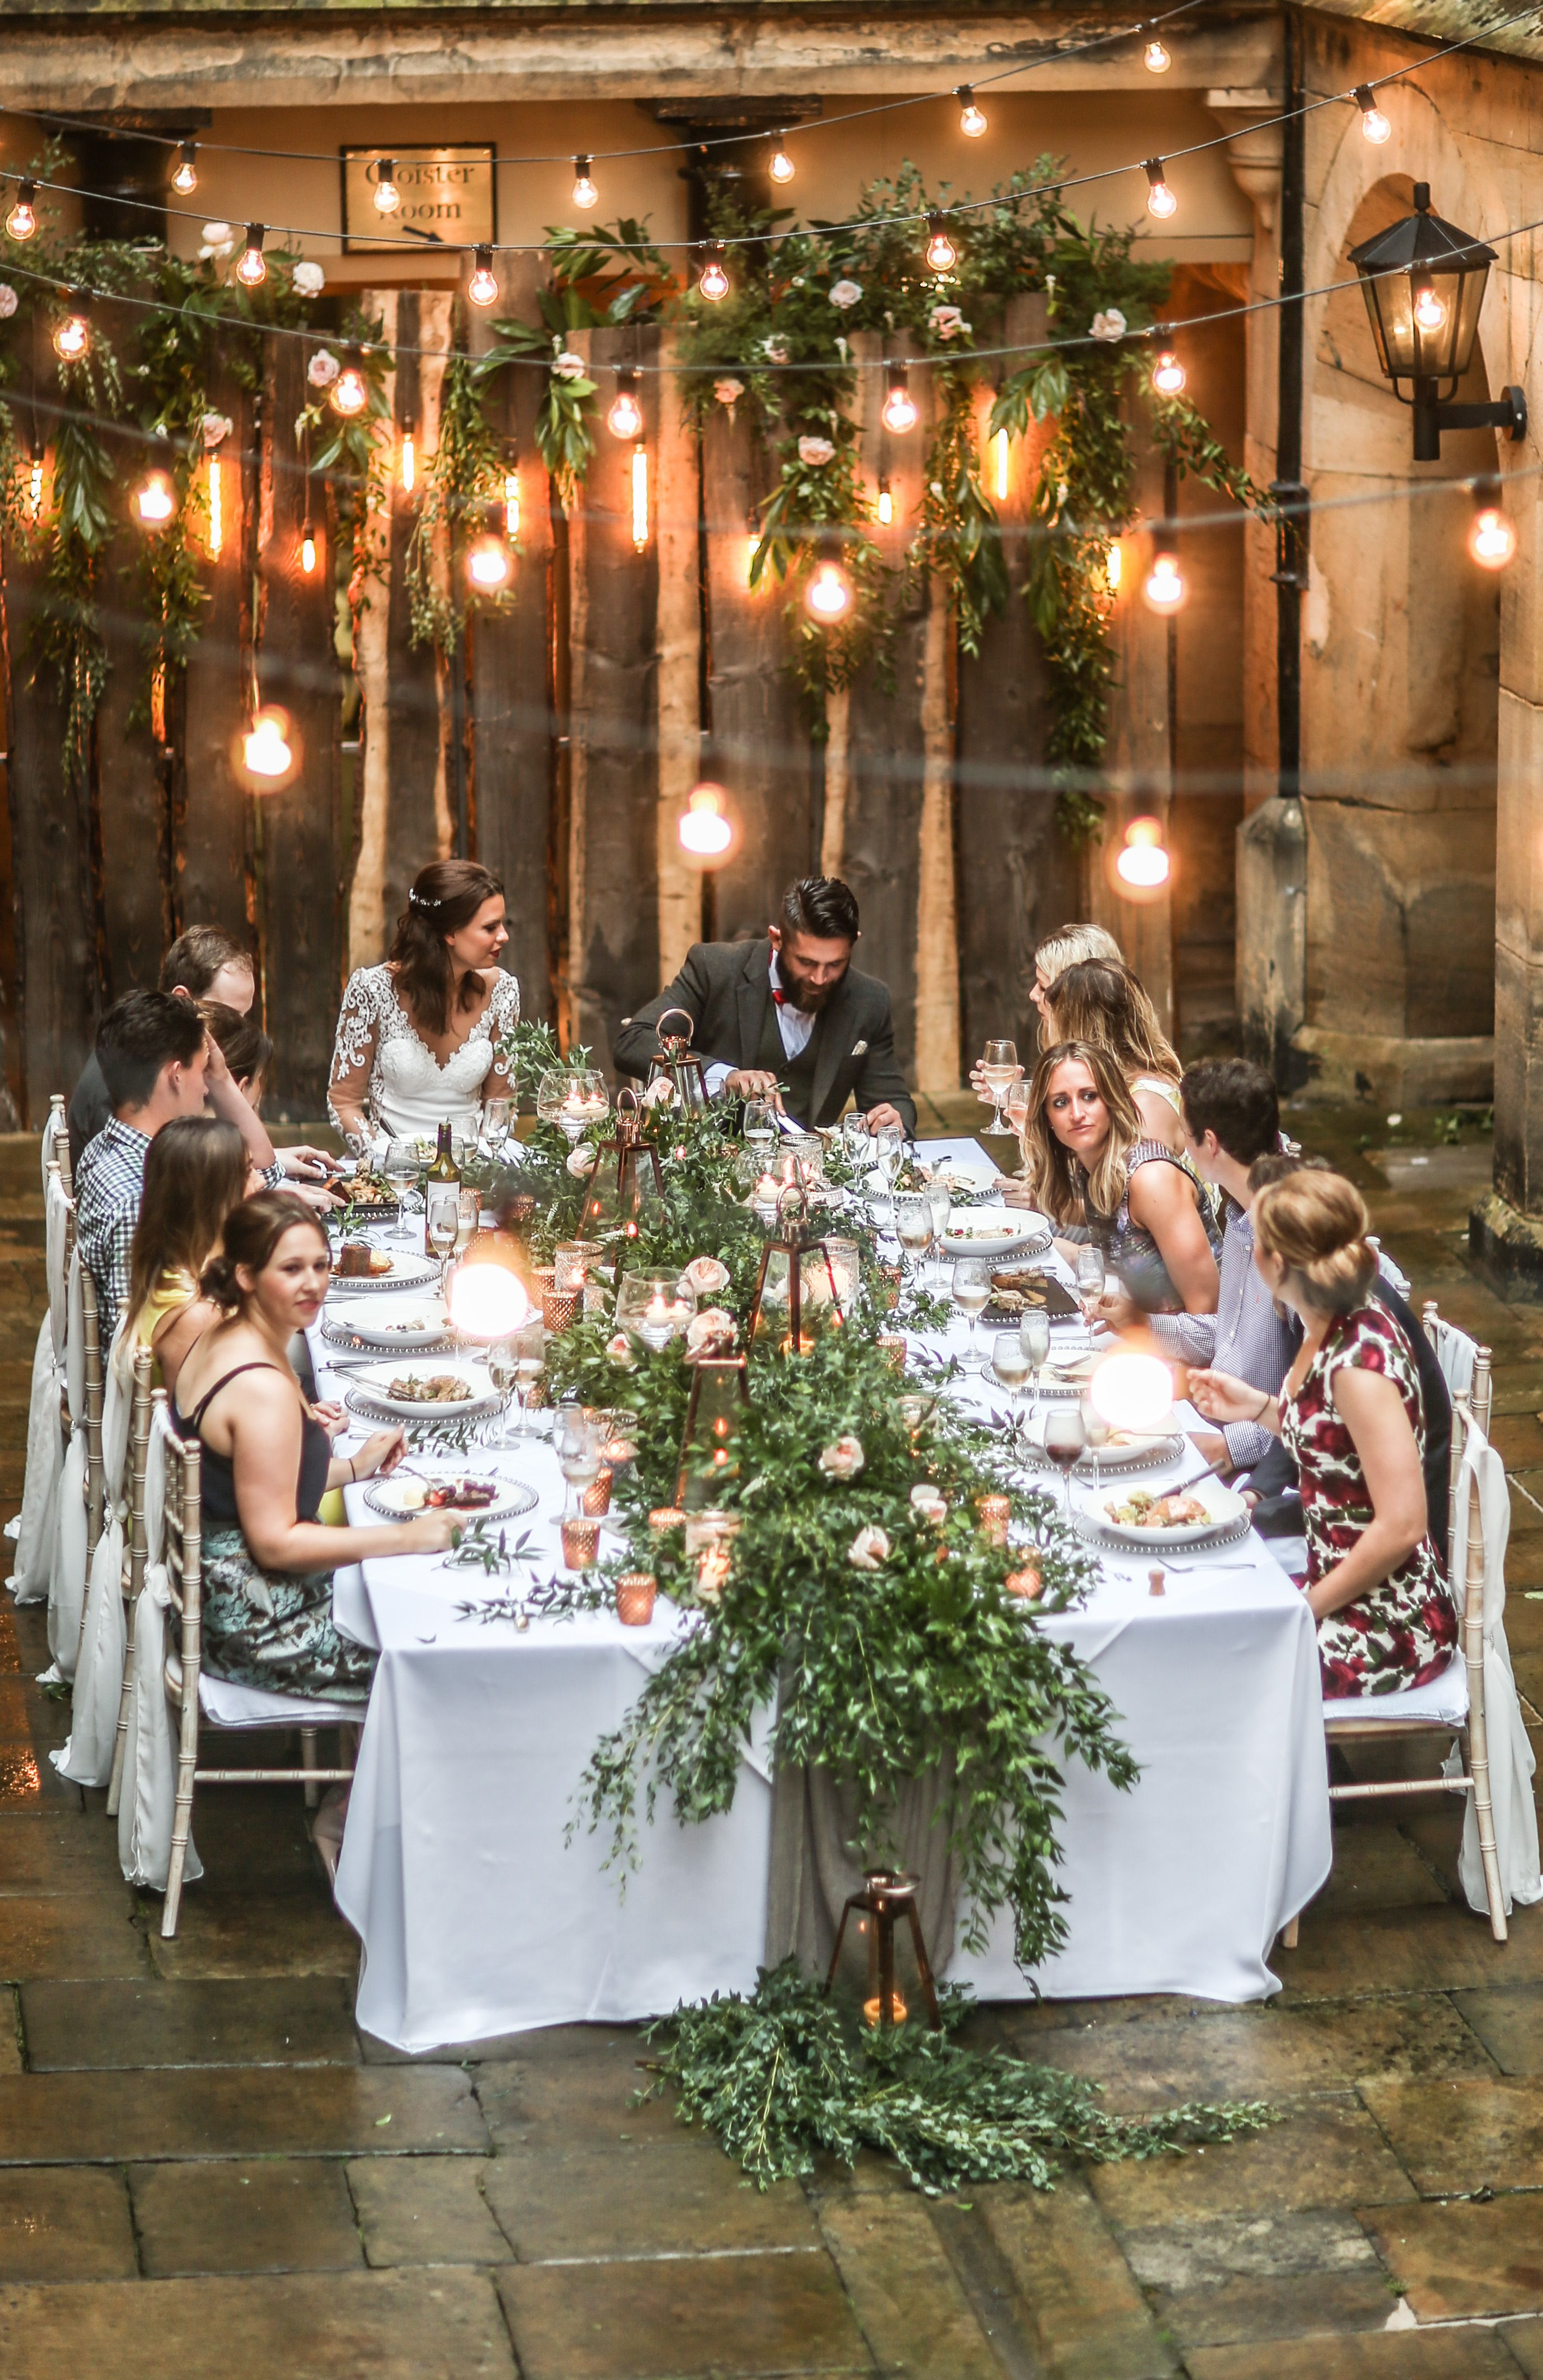 Alfresco Dining Italian Inspired Courtyard Wedding In The Heart Of Northumberland UK